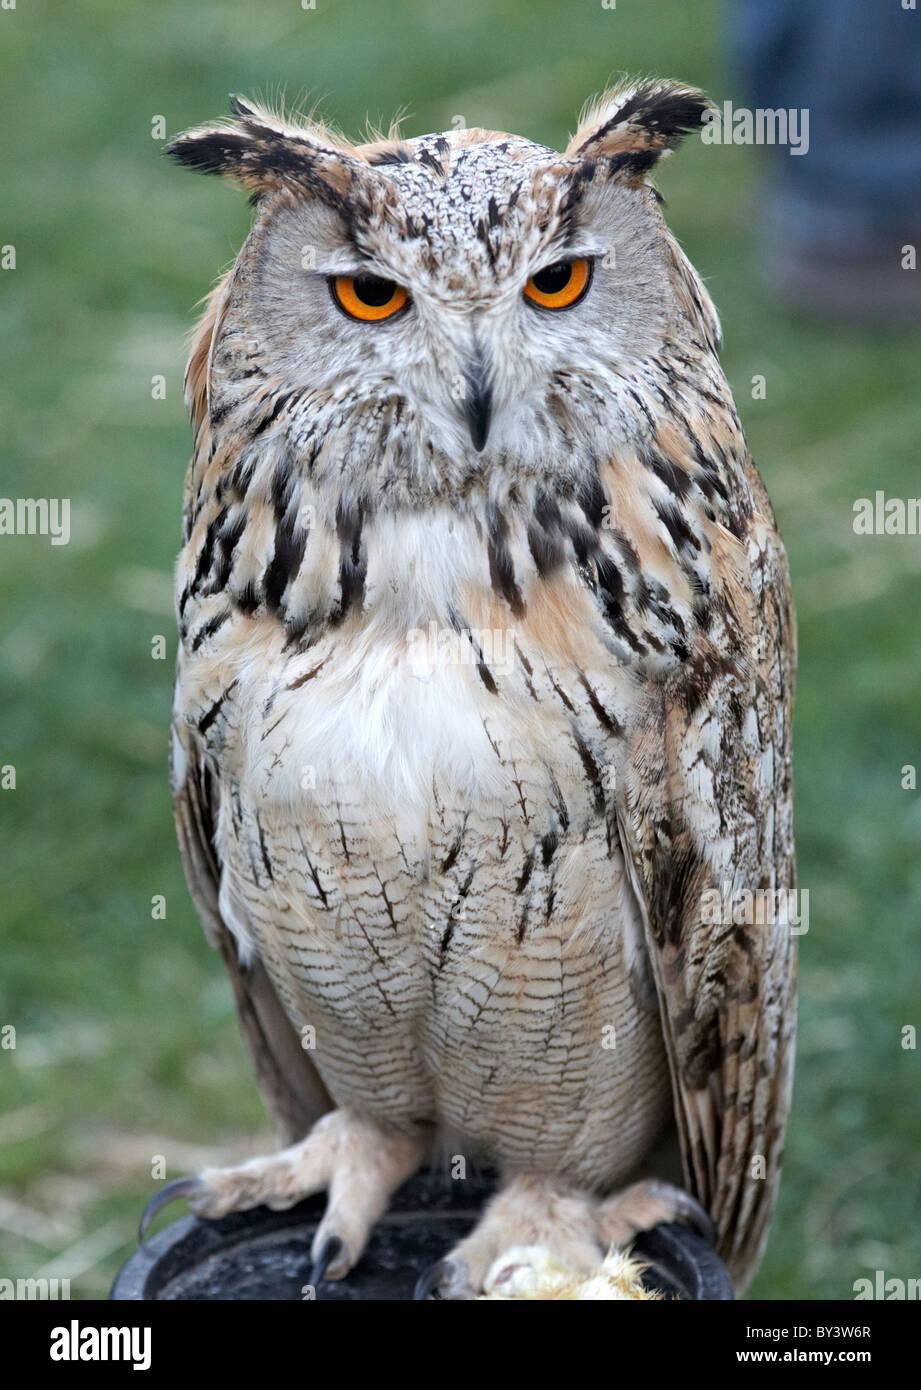 Owl en la granja Butser Wickerman Festival Sussex, UK Imagen De Stock